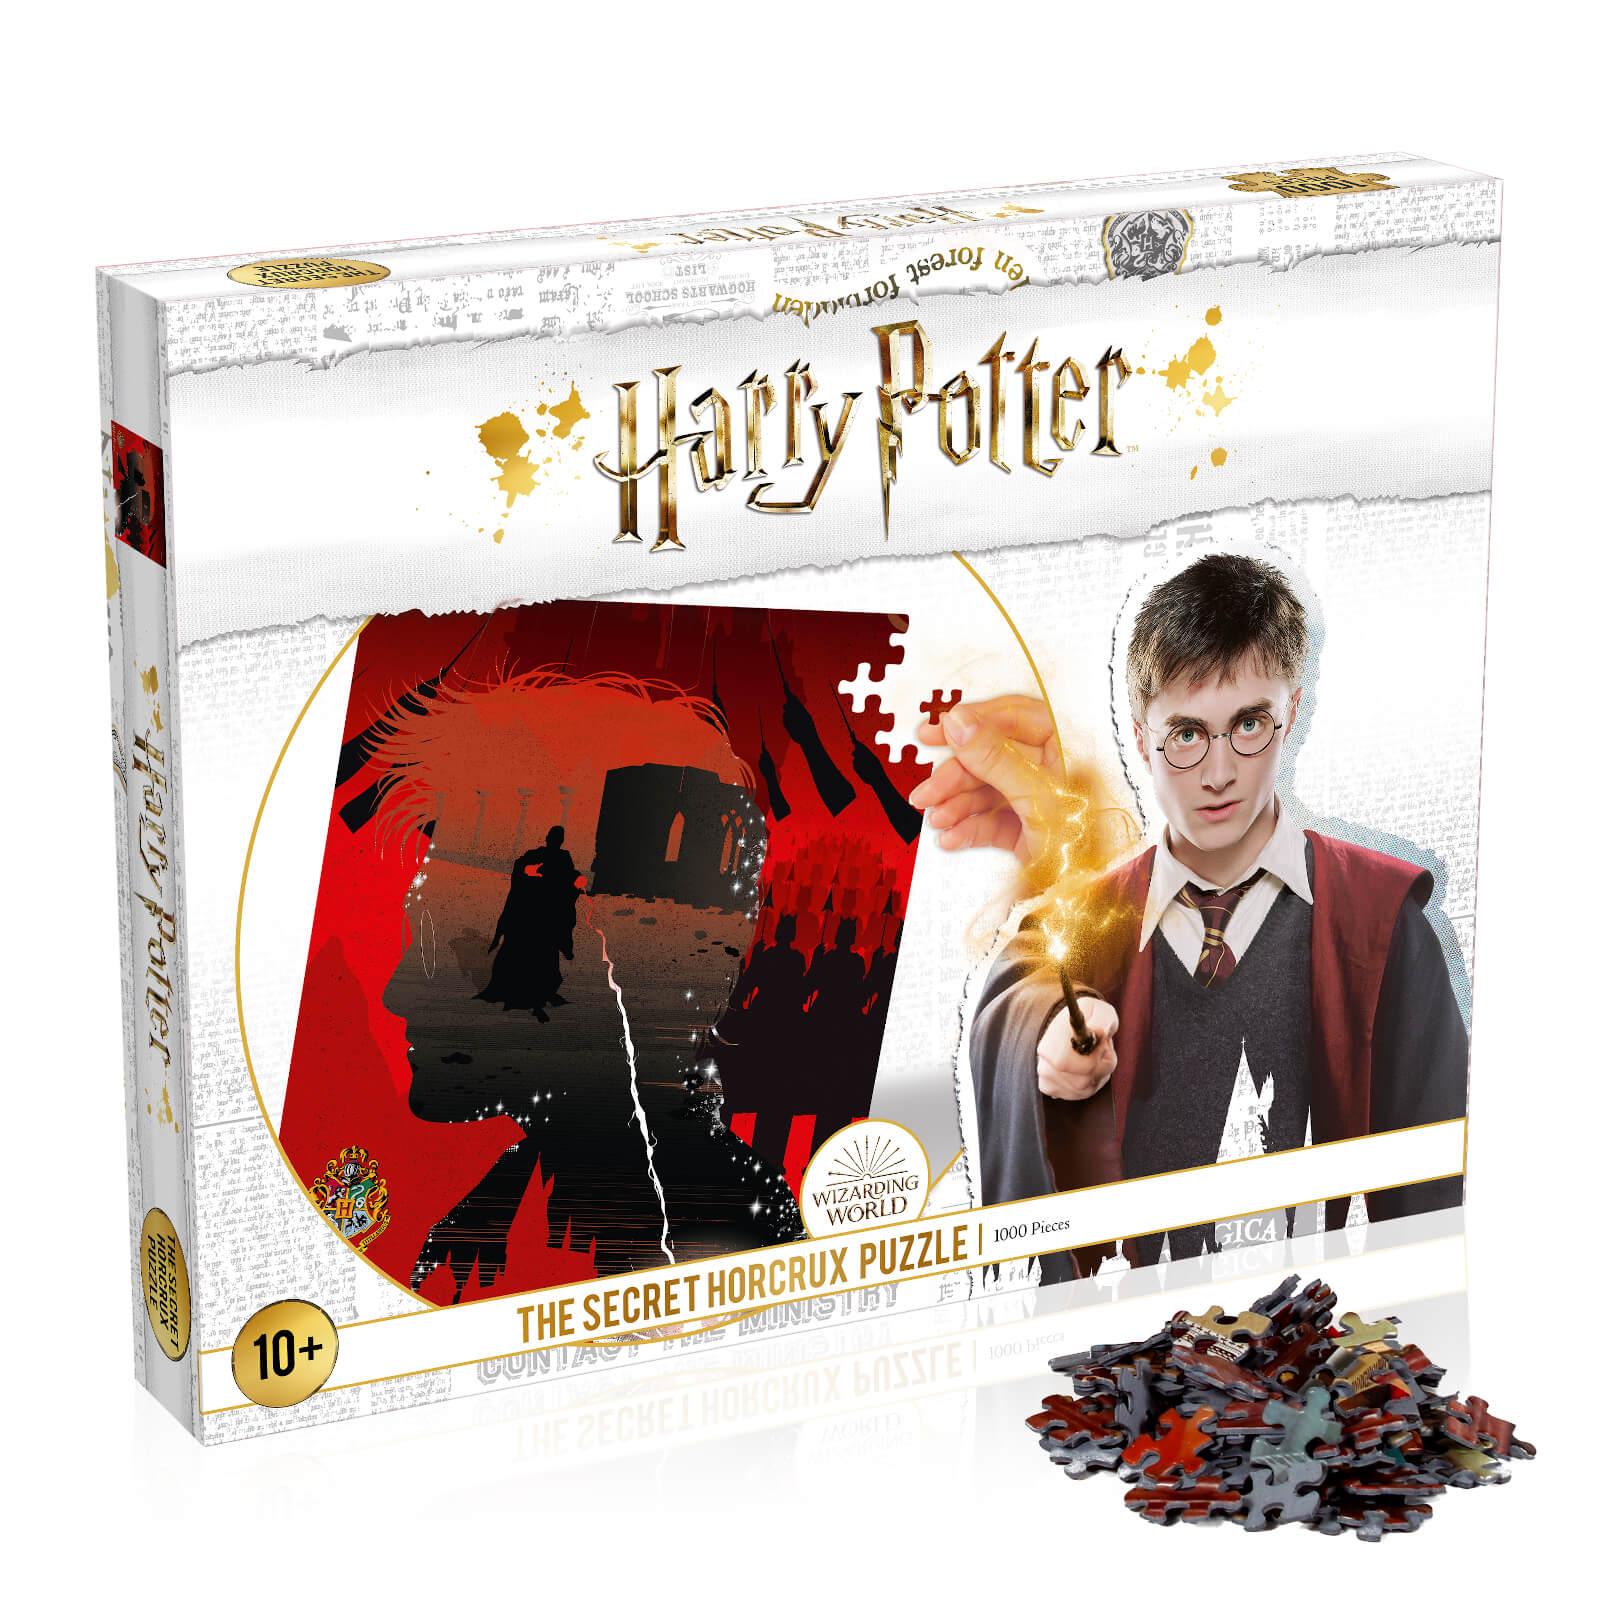 Image of 1000 Piece Jigsaw Puzzle - Harry Potter Secret Horcrux Edition